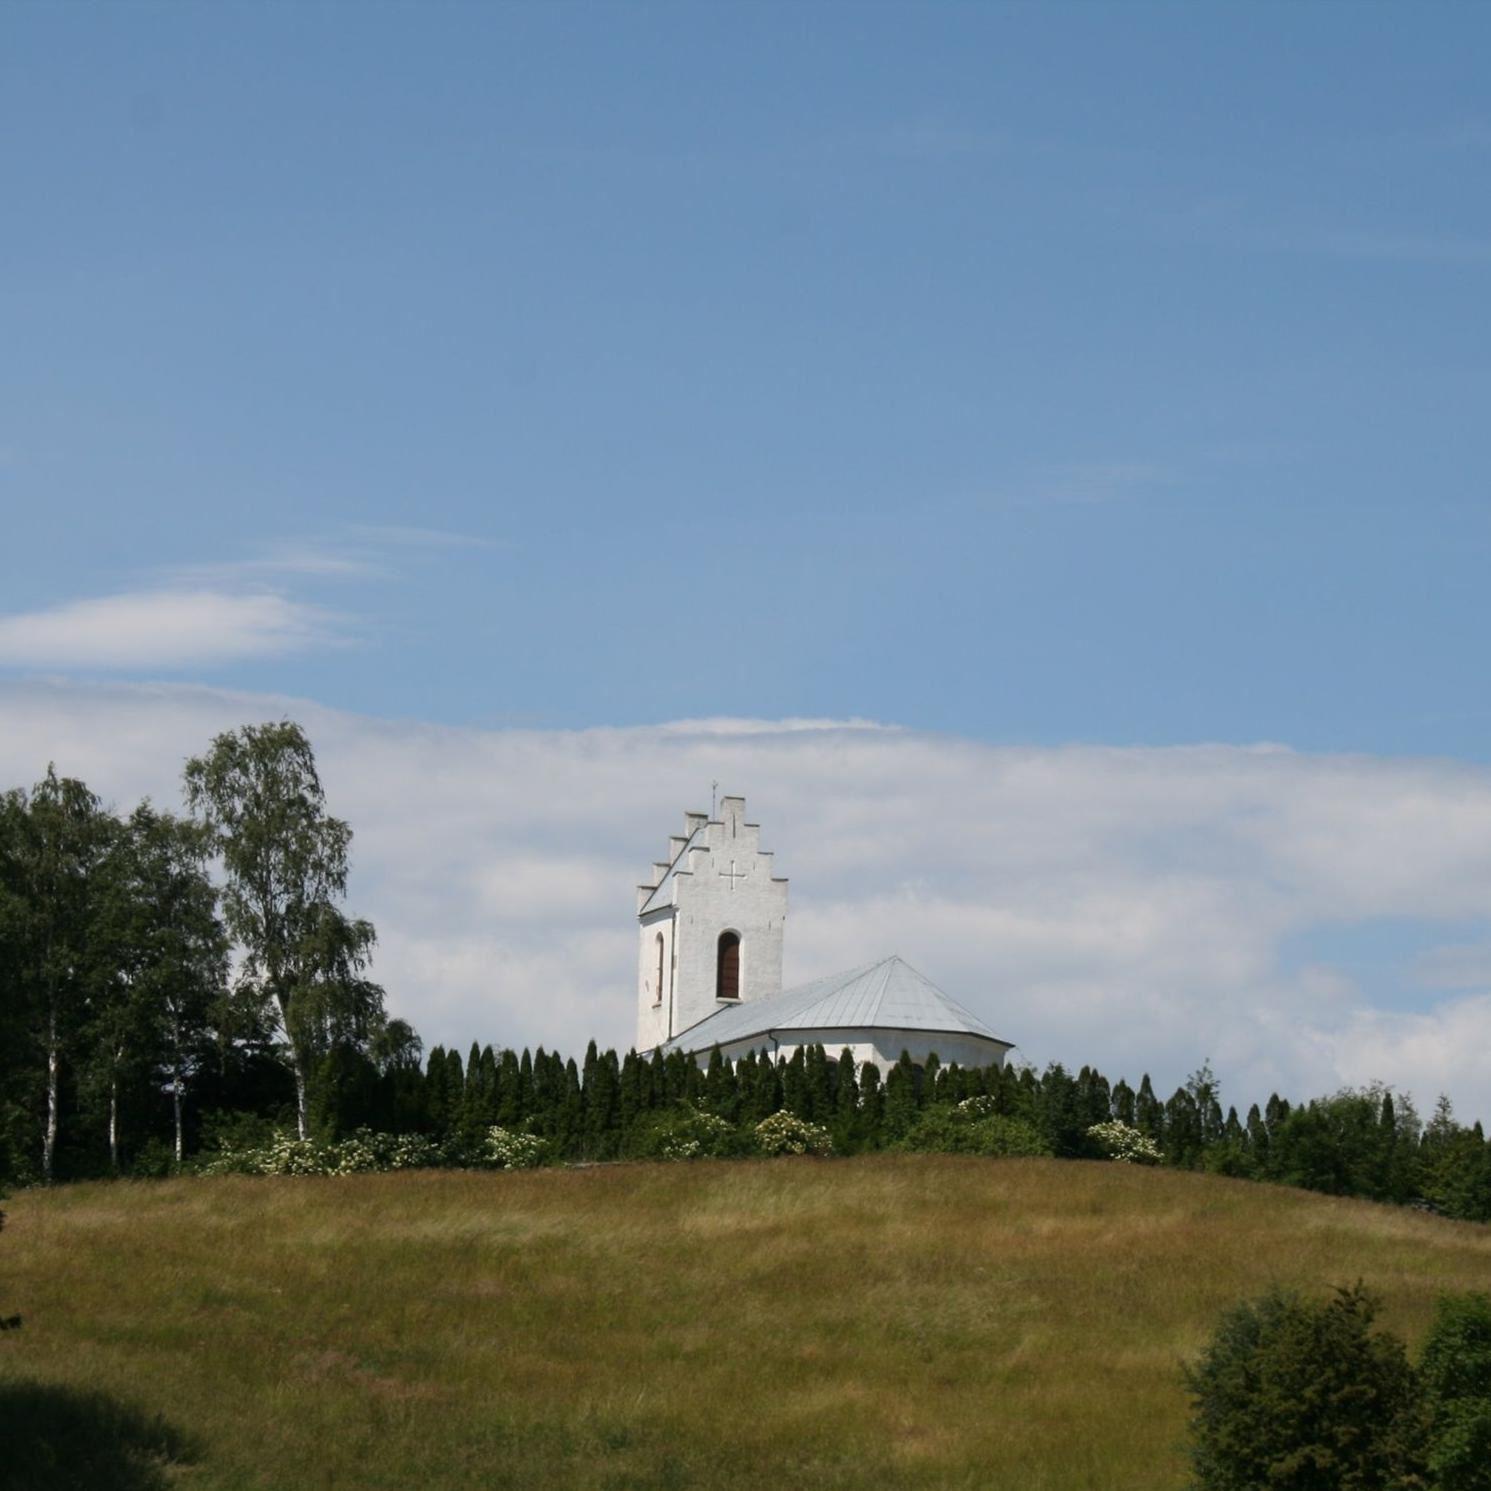 © Kävlinge kommun, Dagstorps kyrka